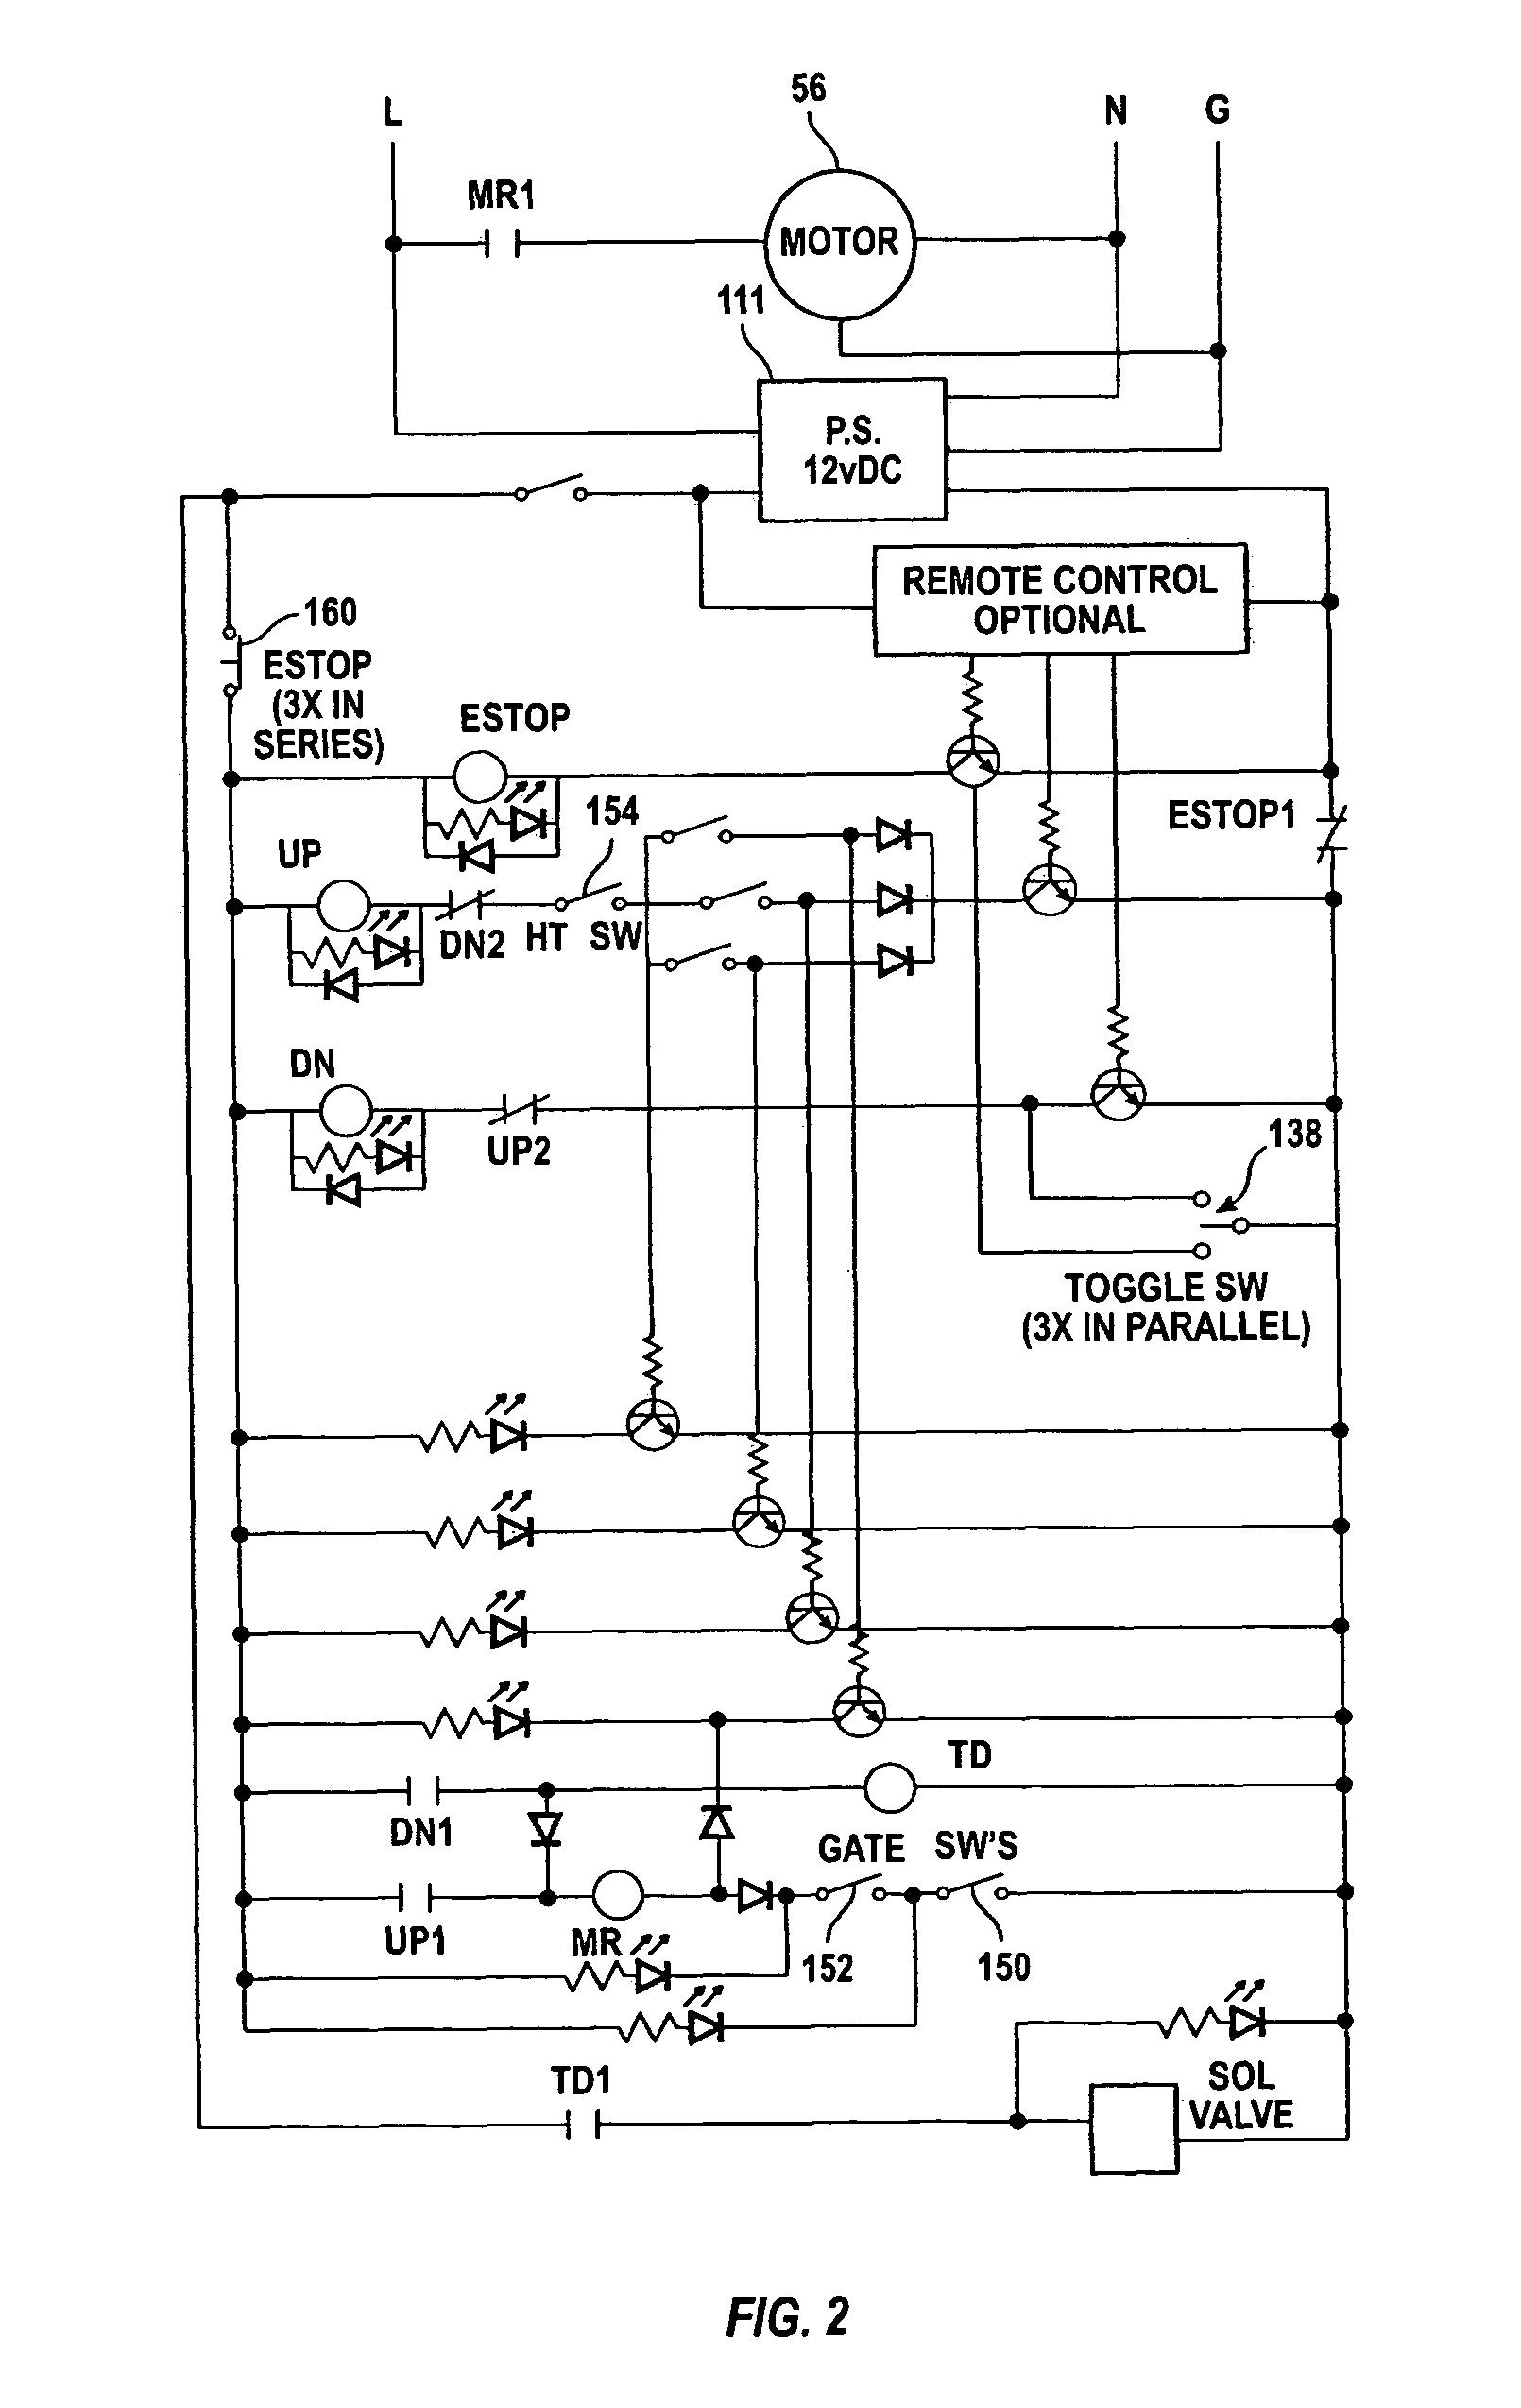 jlg scissor lift wiring diagram model 6832 wiring  jlg scissor lift wiring diagram model 6832 #4